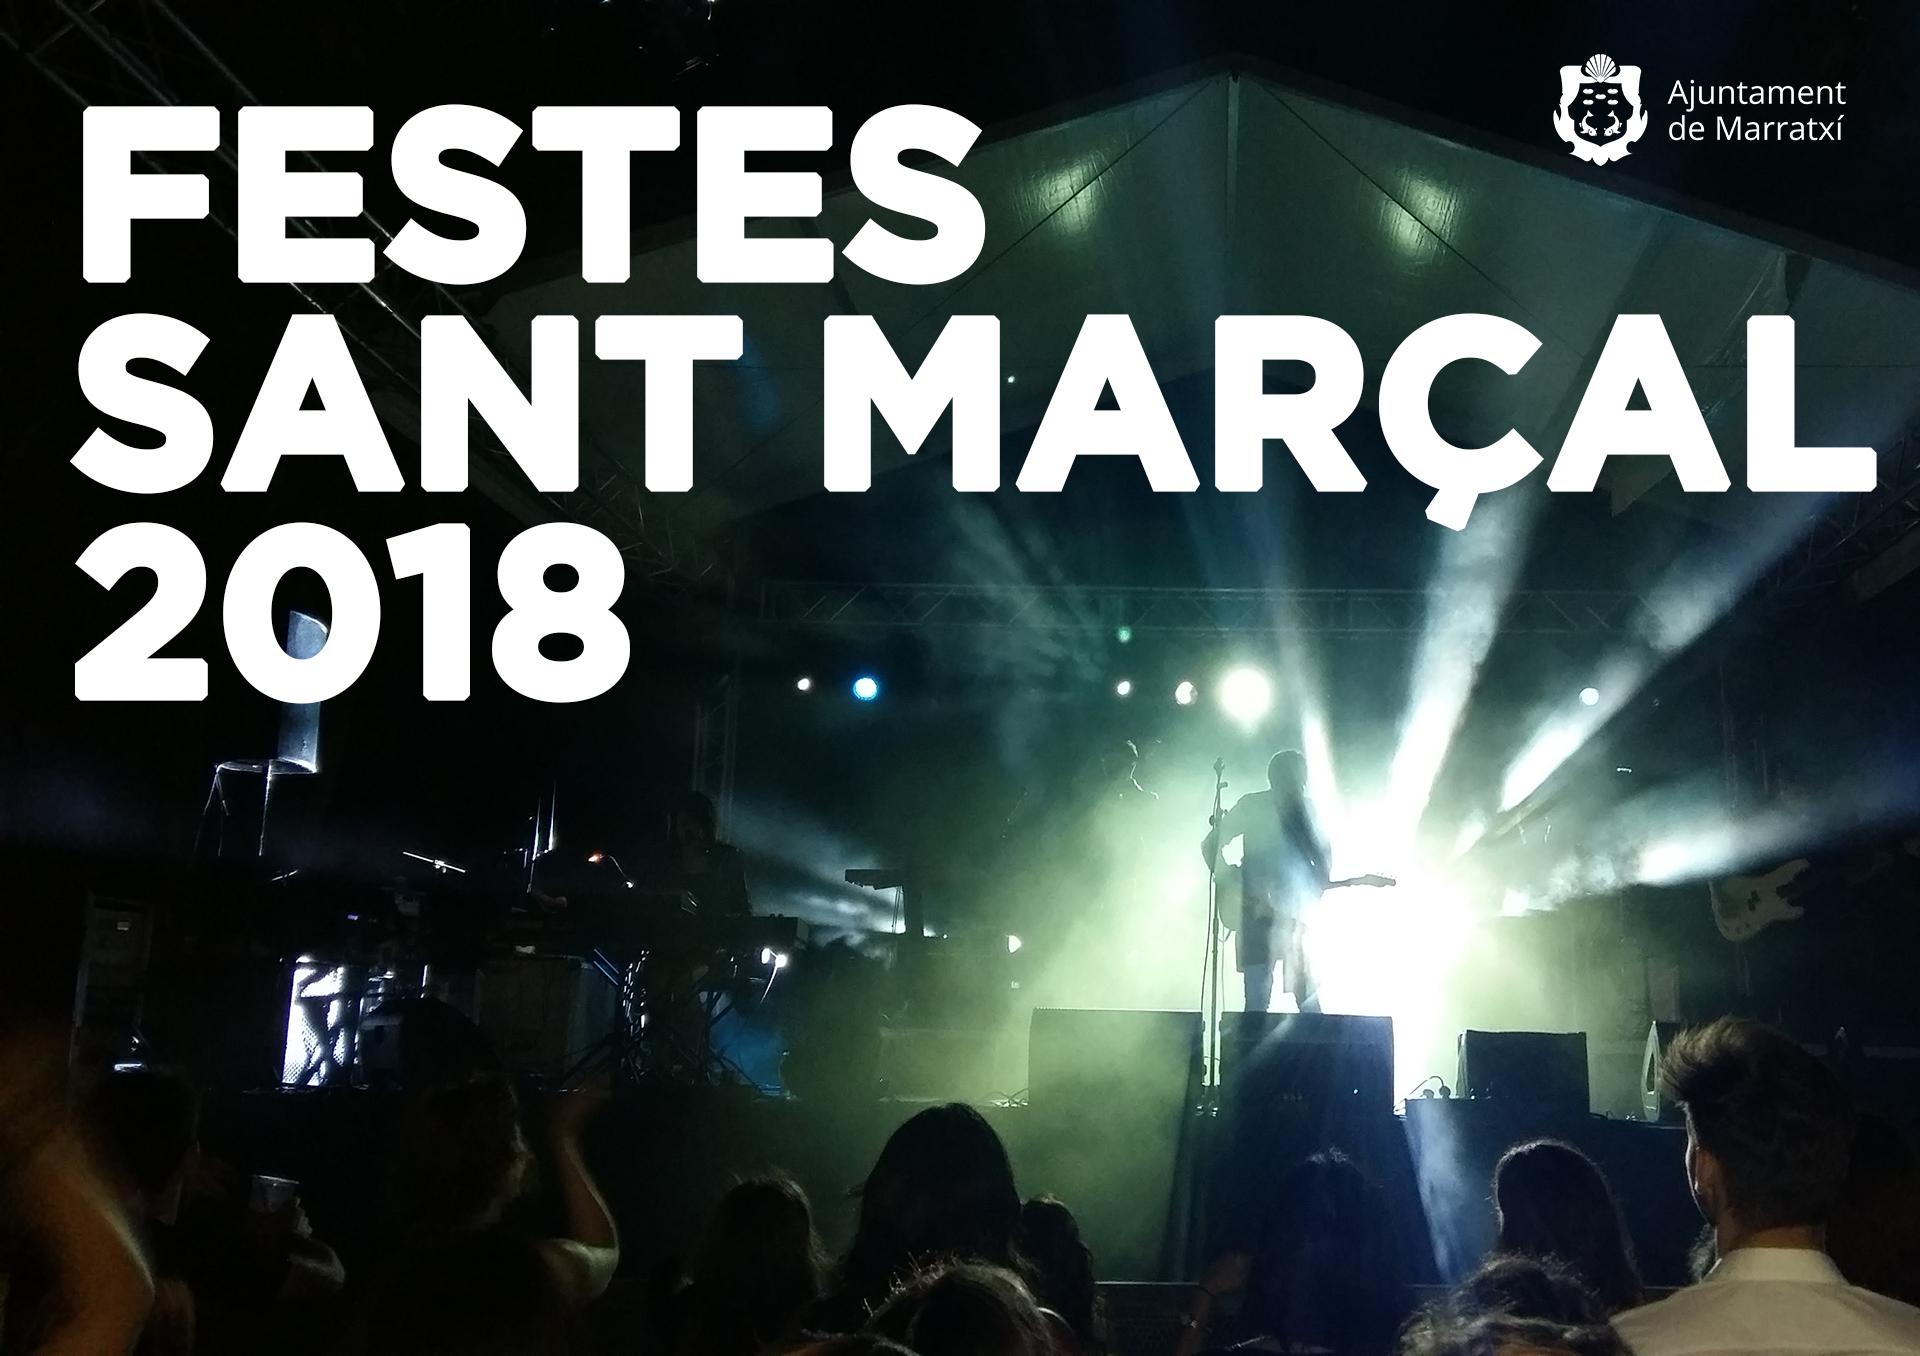 Festes Sant Marçal 2018 previa